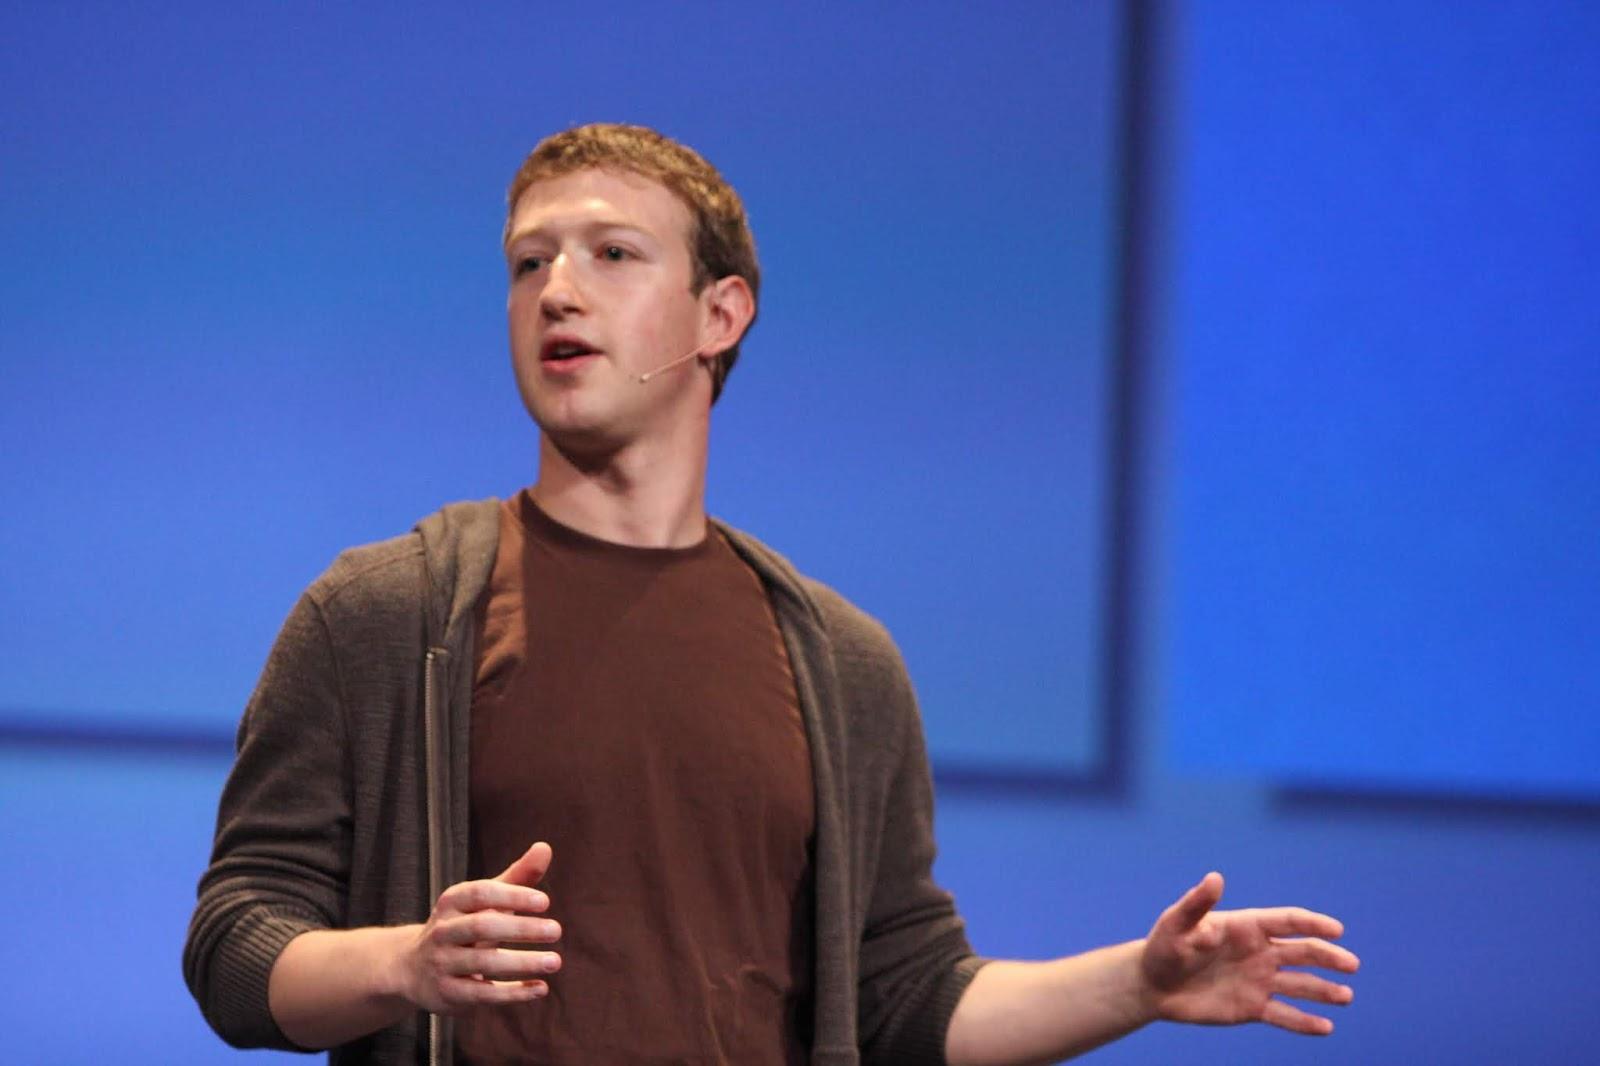 Facebook CEO Mark Zuckerberg Becomes Third Richest Person Alive